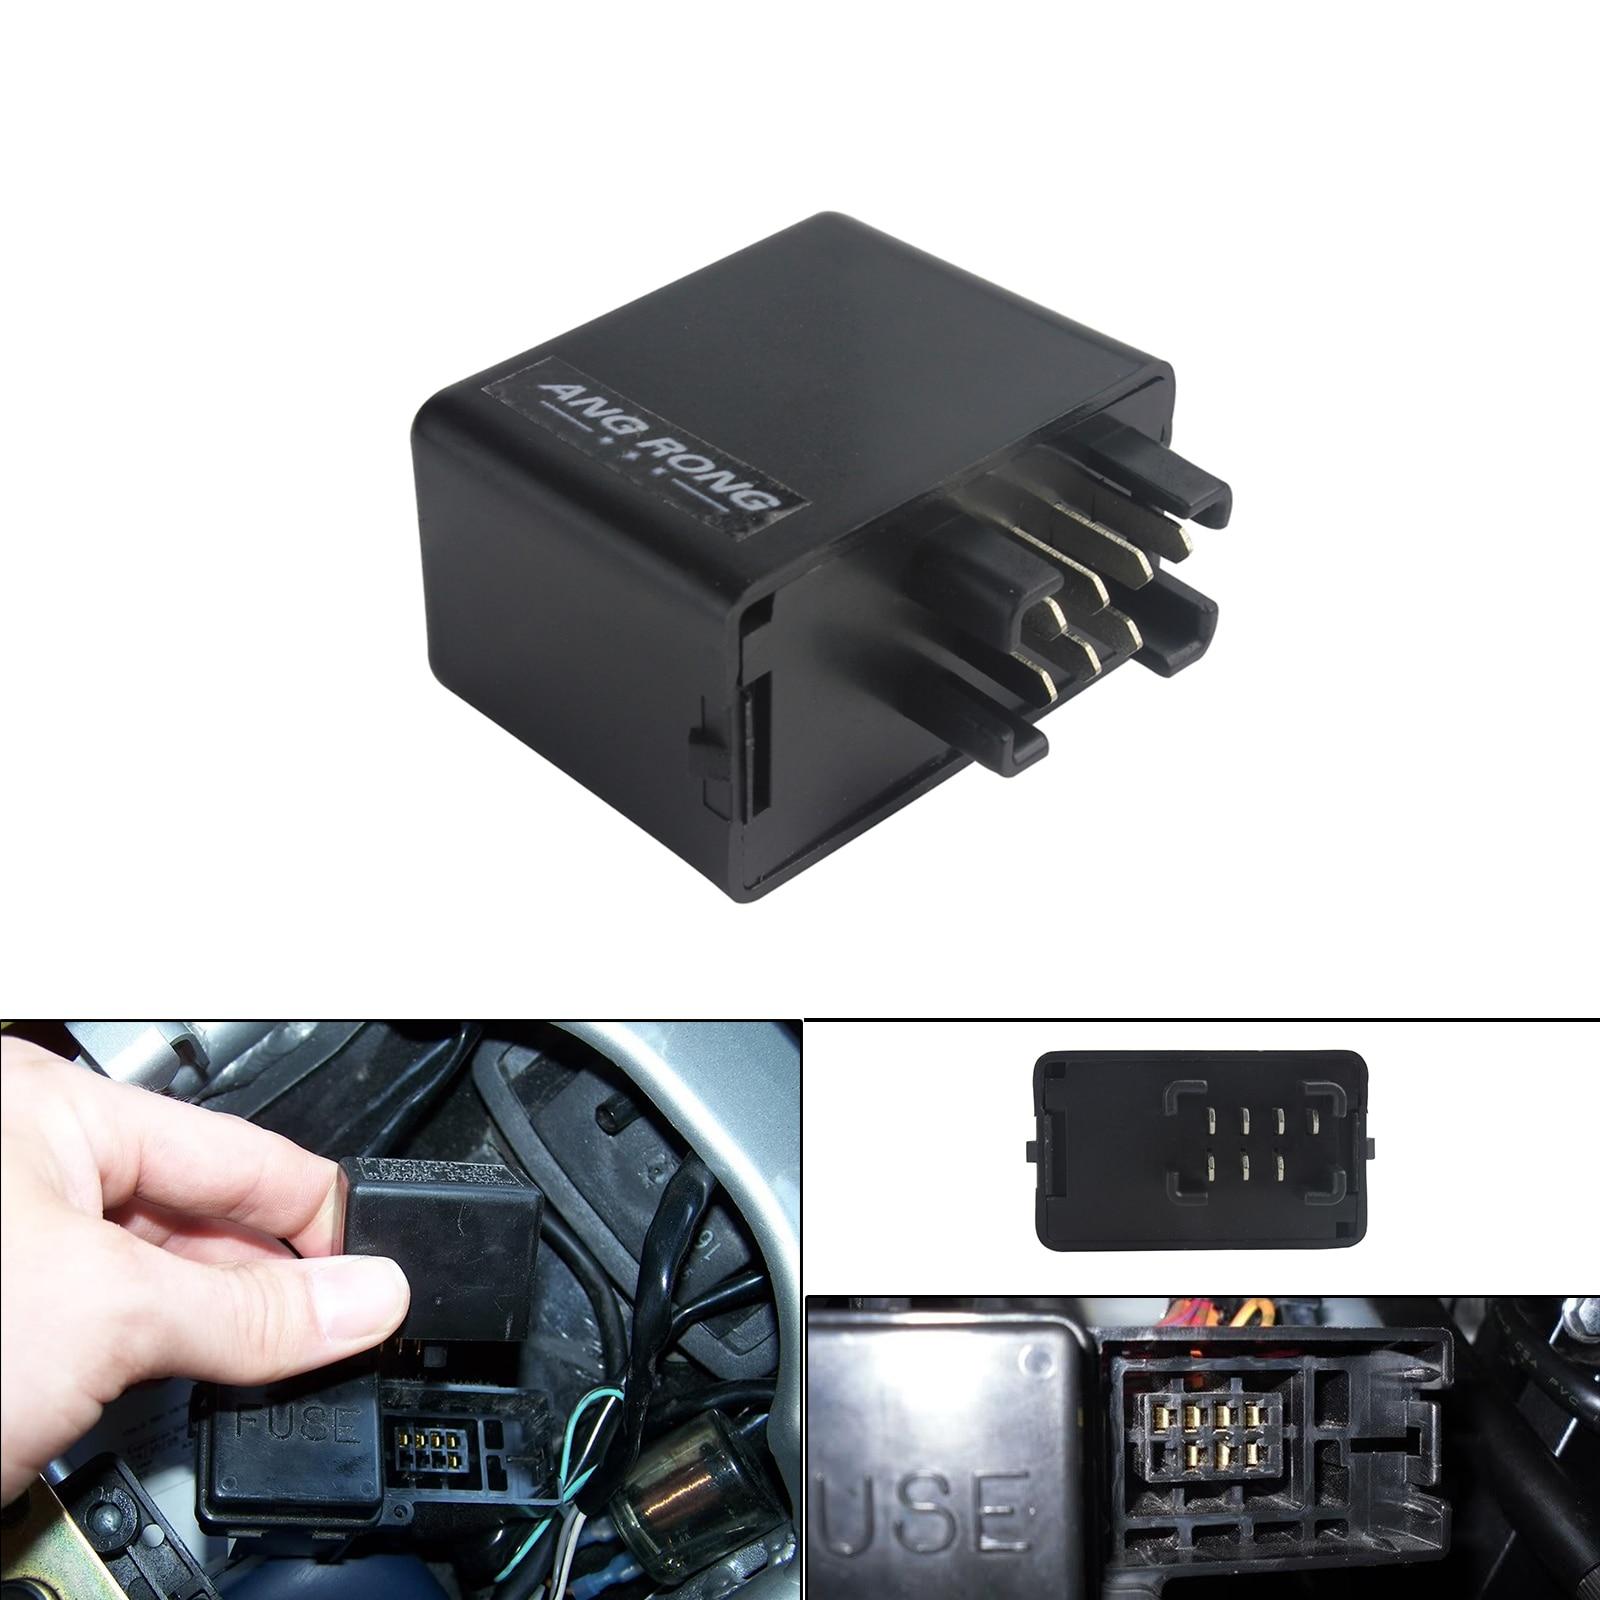 Relé de señal intermitente ANGRONG de 7 pines para indicadores LED para Suzuki GSXR 600 SV 650 GSX 650F